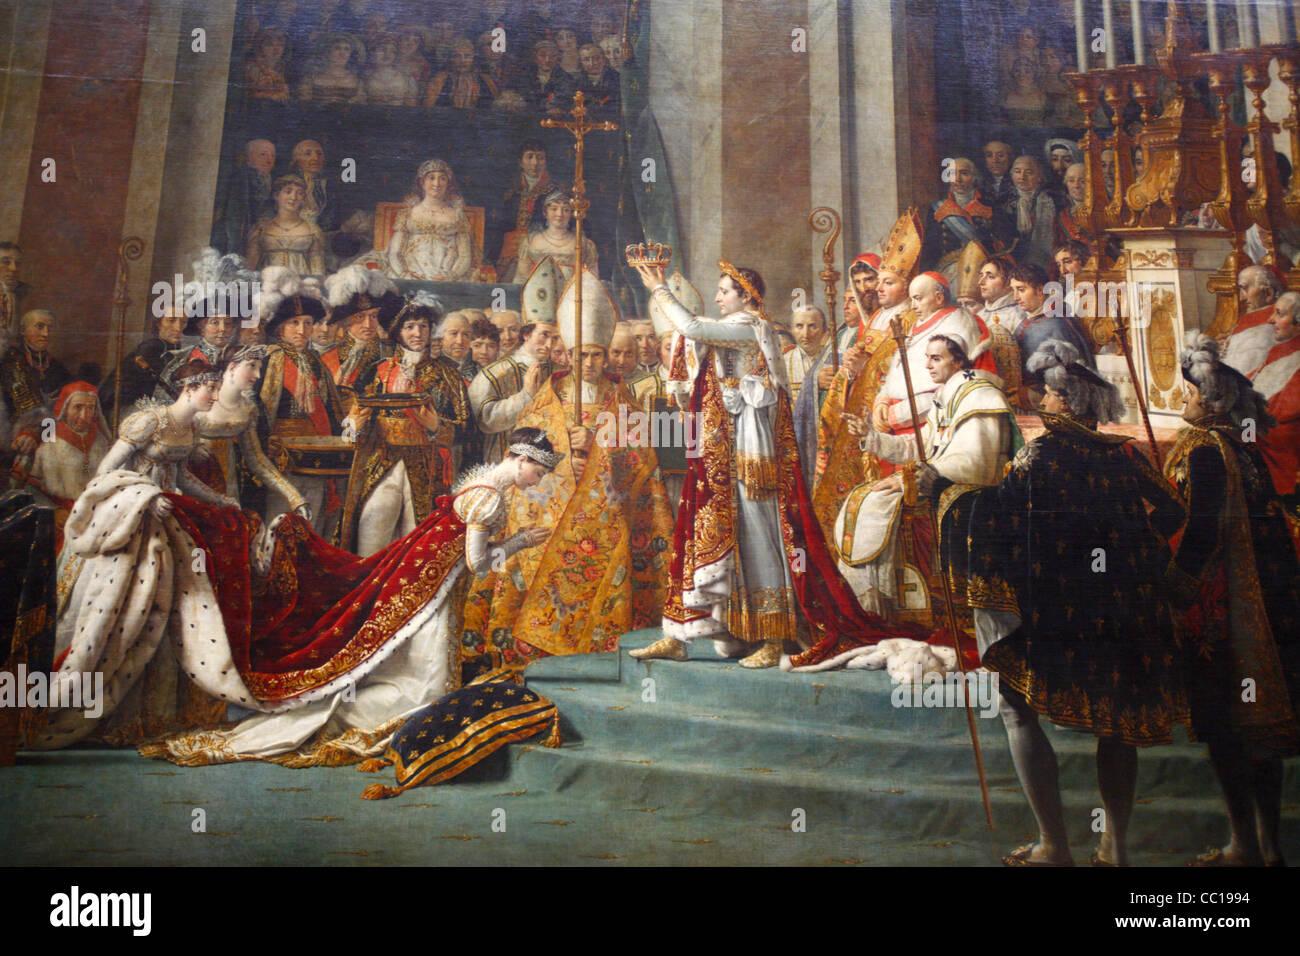 The coronation of Napoleon painting, Louvre Museum, Paris, France - Stock Image